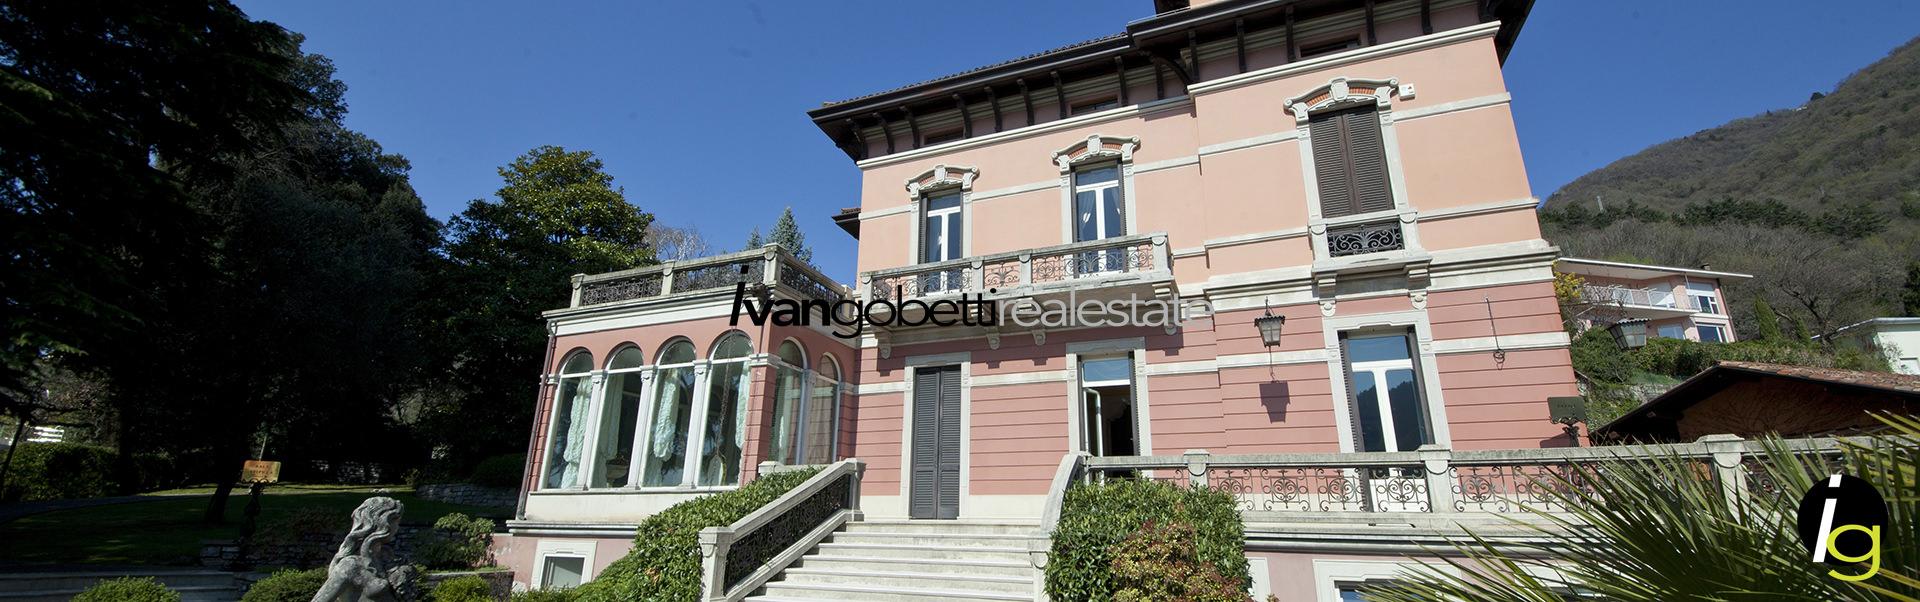 Vendesi prestigiosa villa liberty con parco e vista lago a Cernobbio